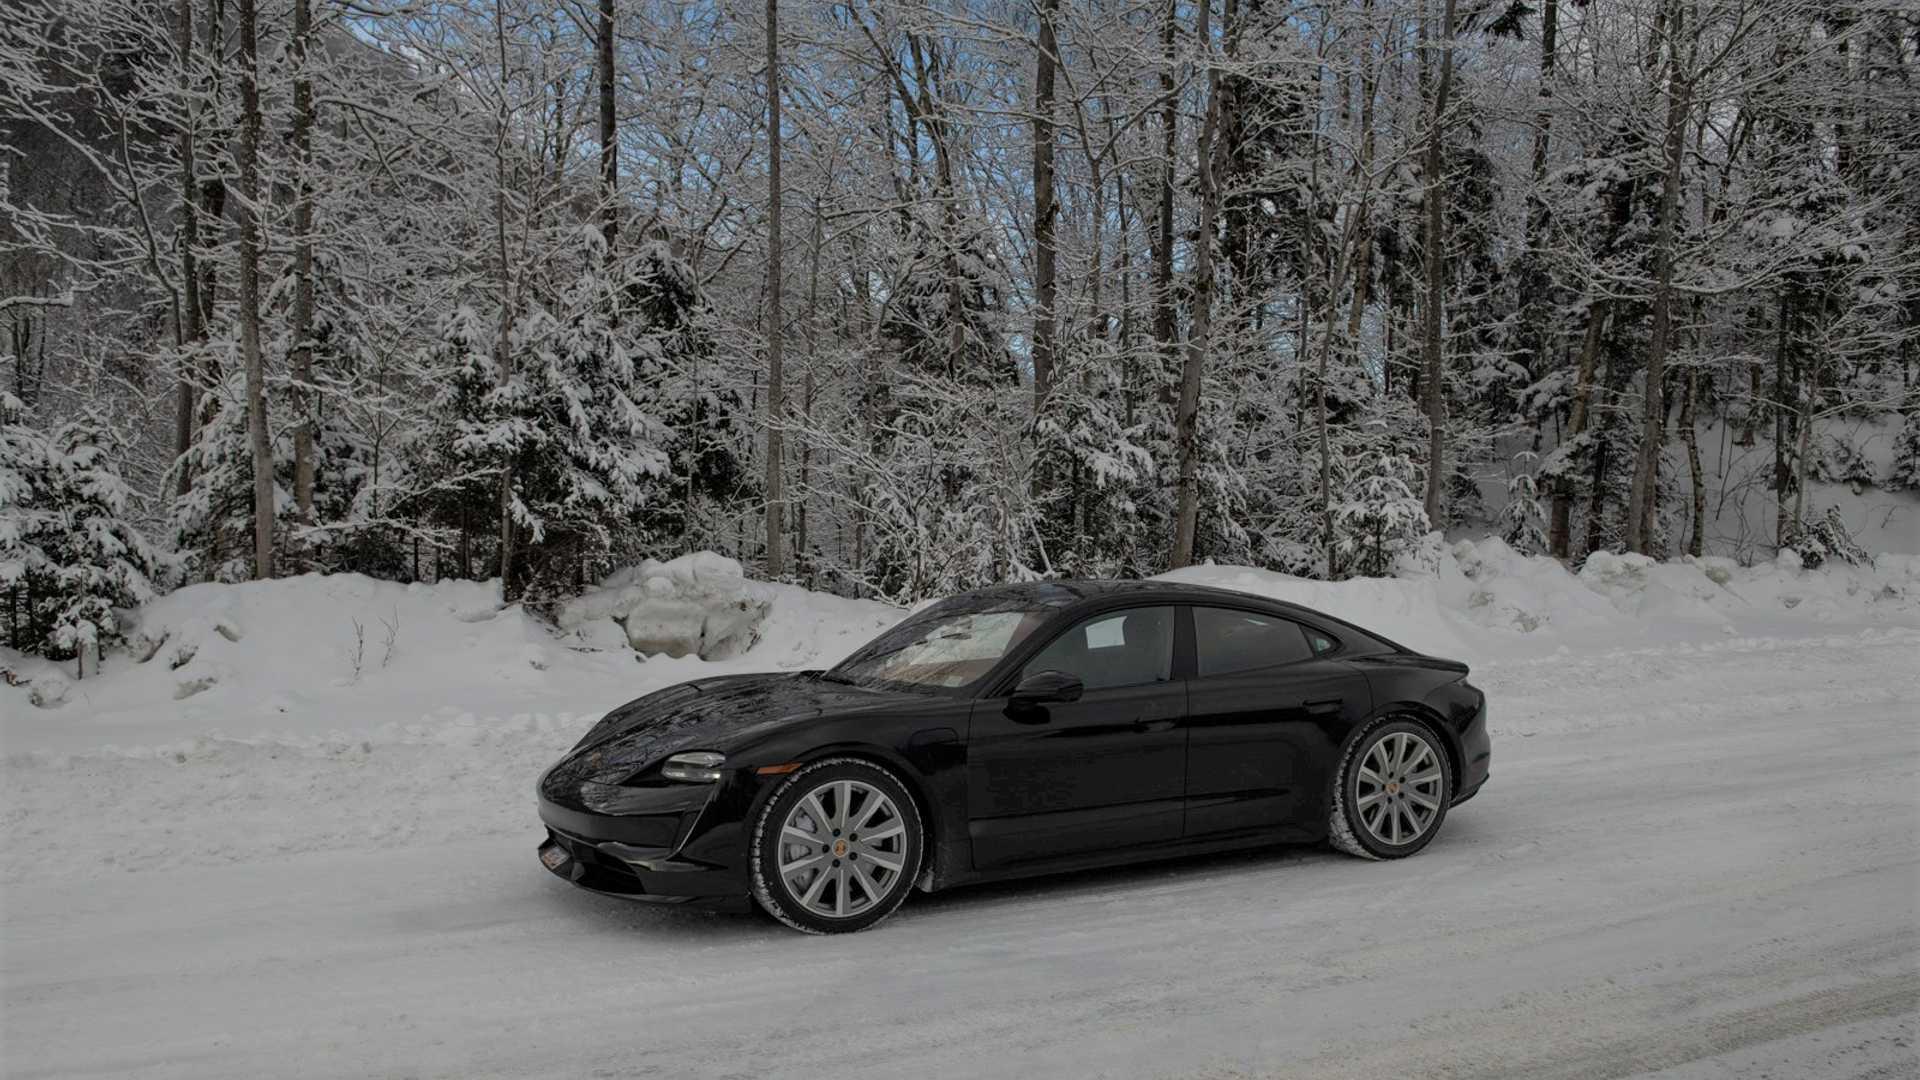 Road_trip_Porsche_Taycan_Turbo_0005